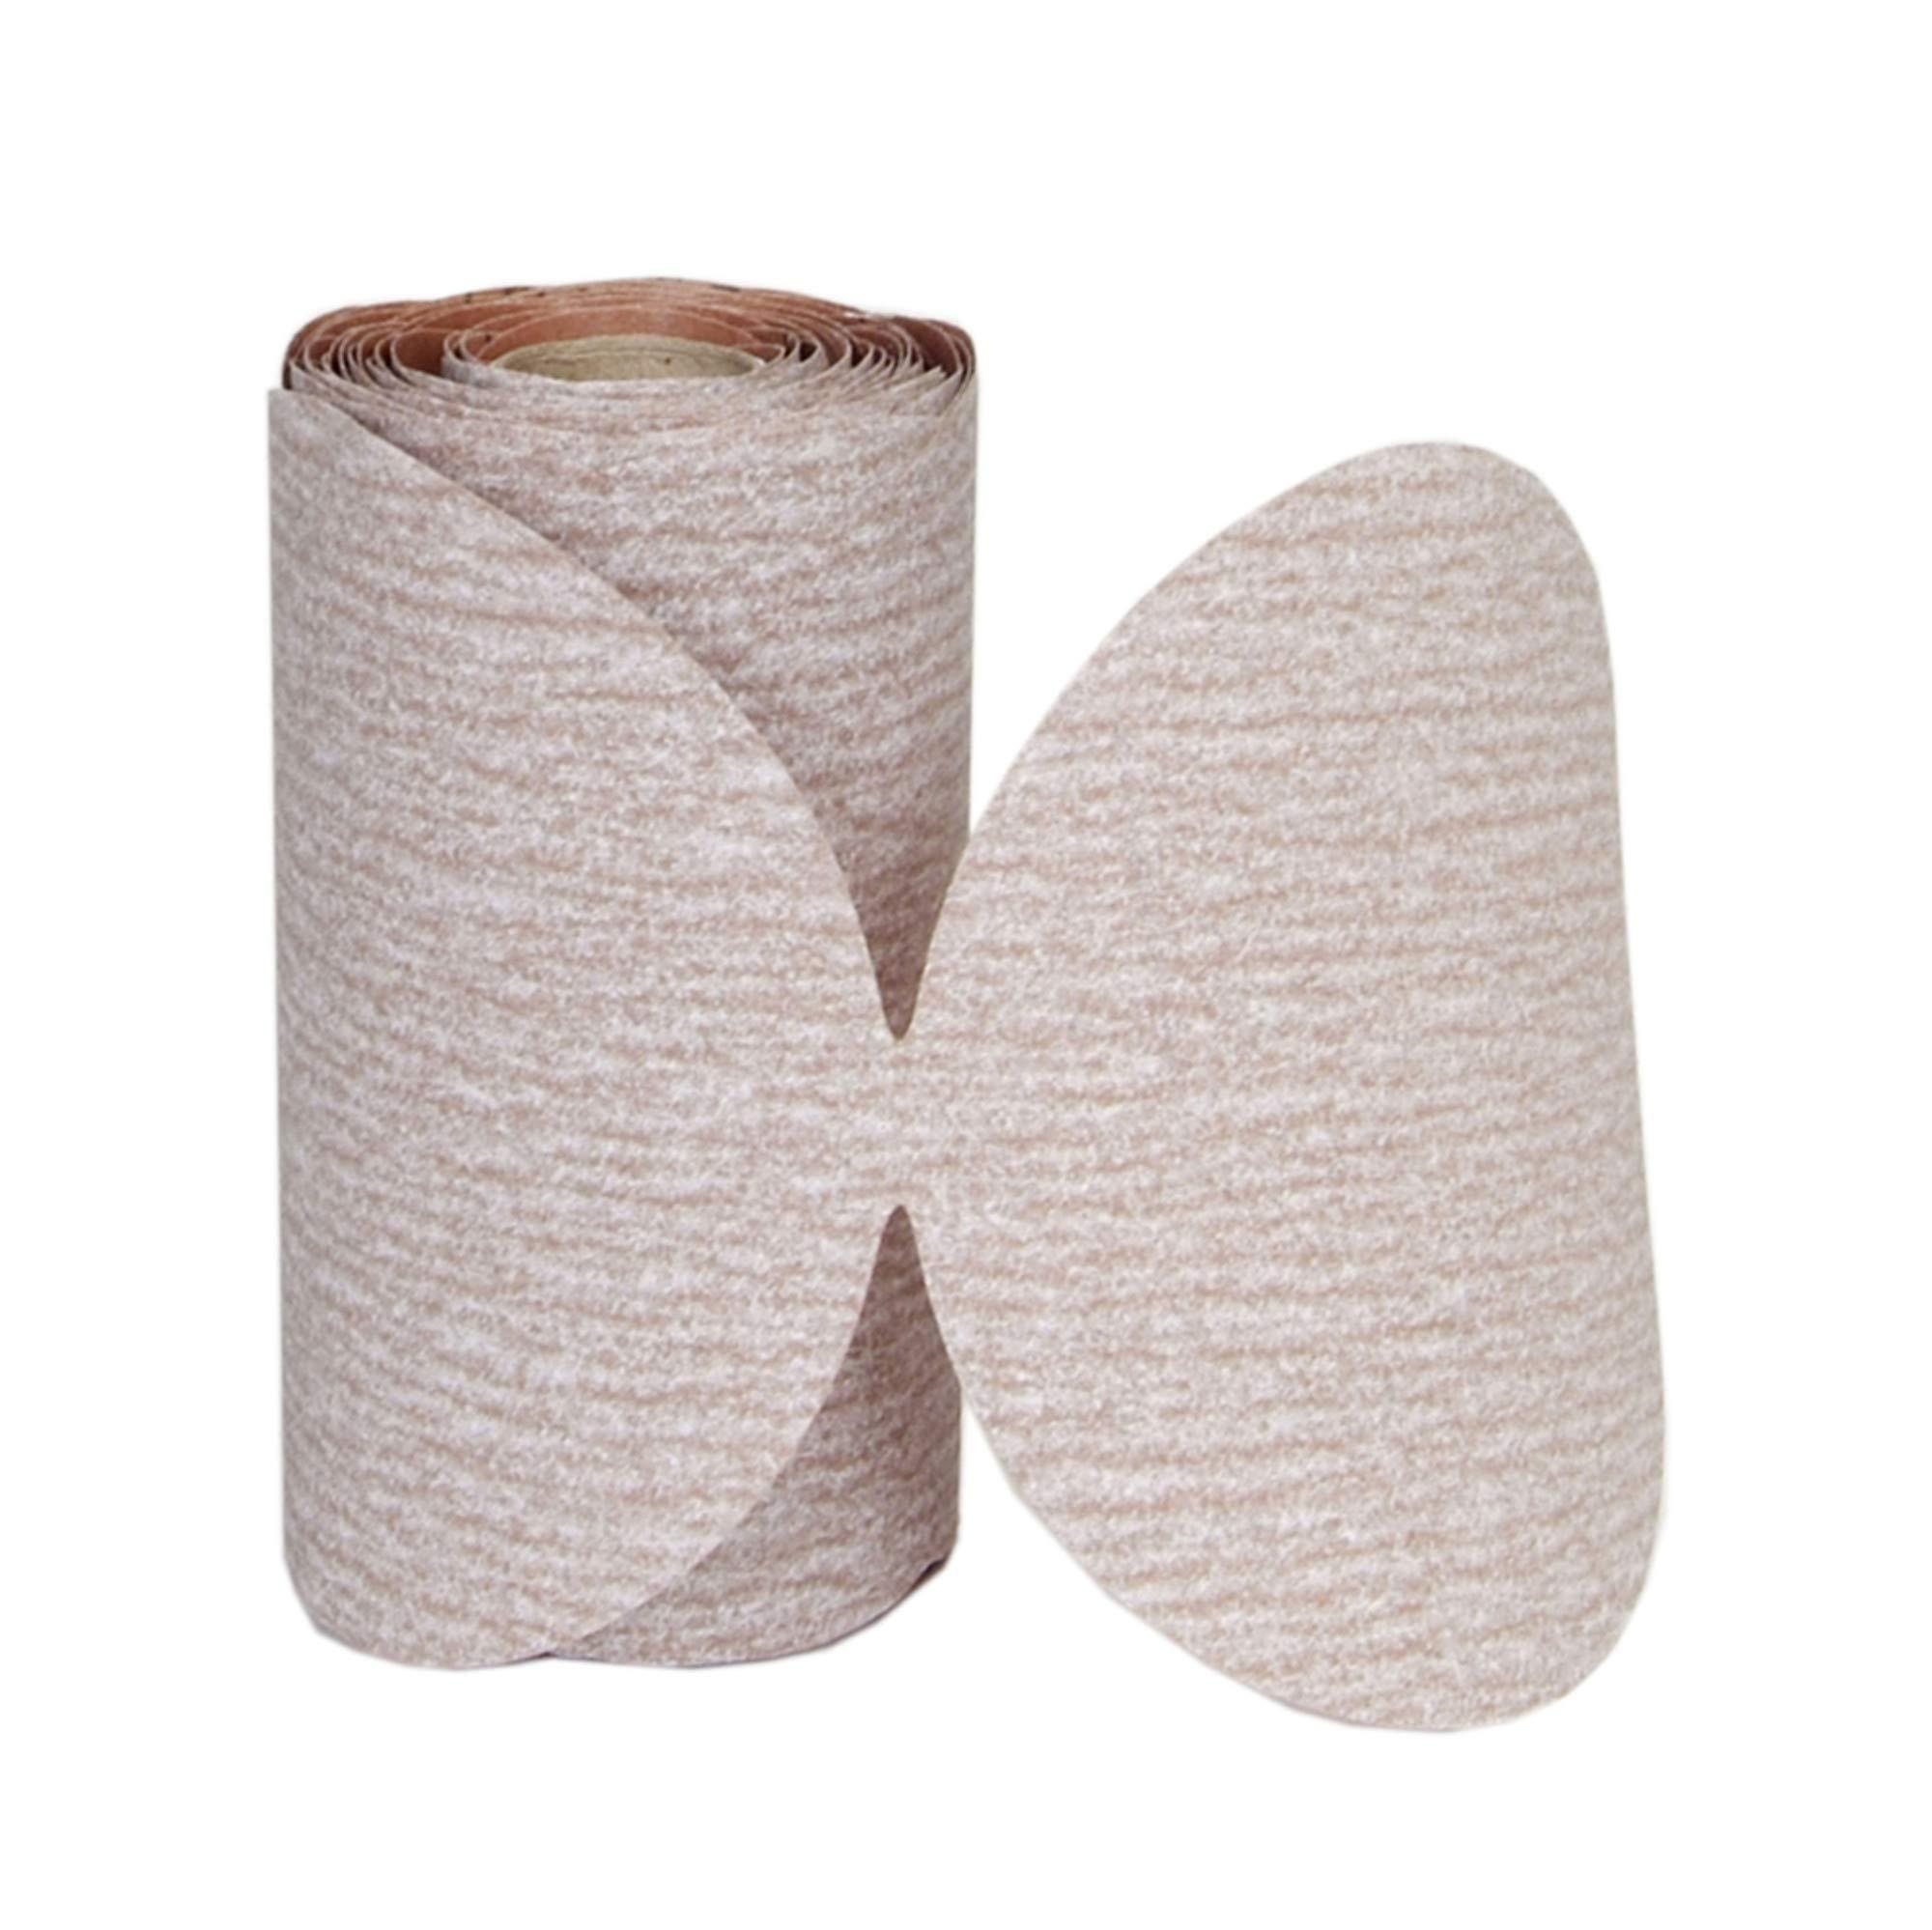 Norton A275 No-Fil Adalox Paper Abrasive Disc, Fiber Backing, Pressure-Sensitive Adhesive, Aluminium Oxide, 5'' Diameter, Grit 100 (Roll of 100)